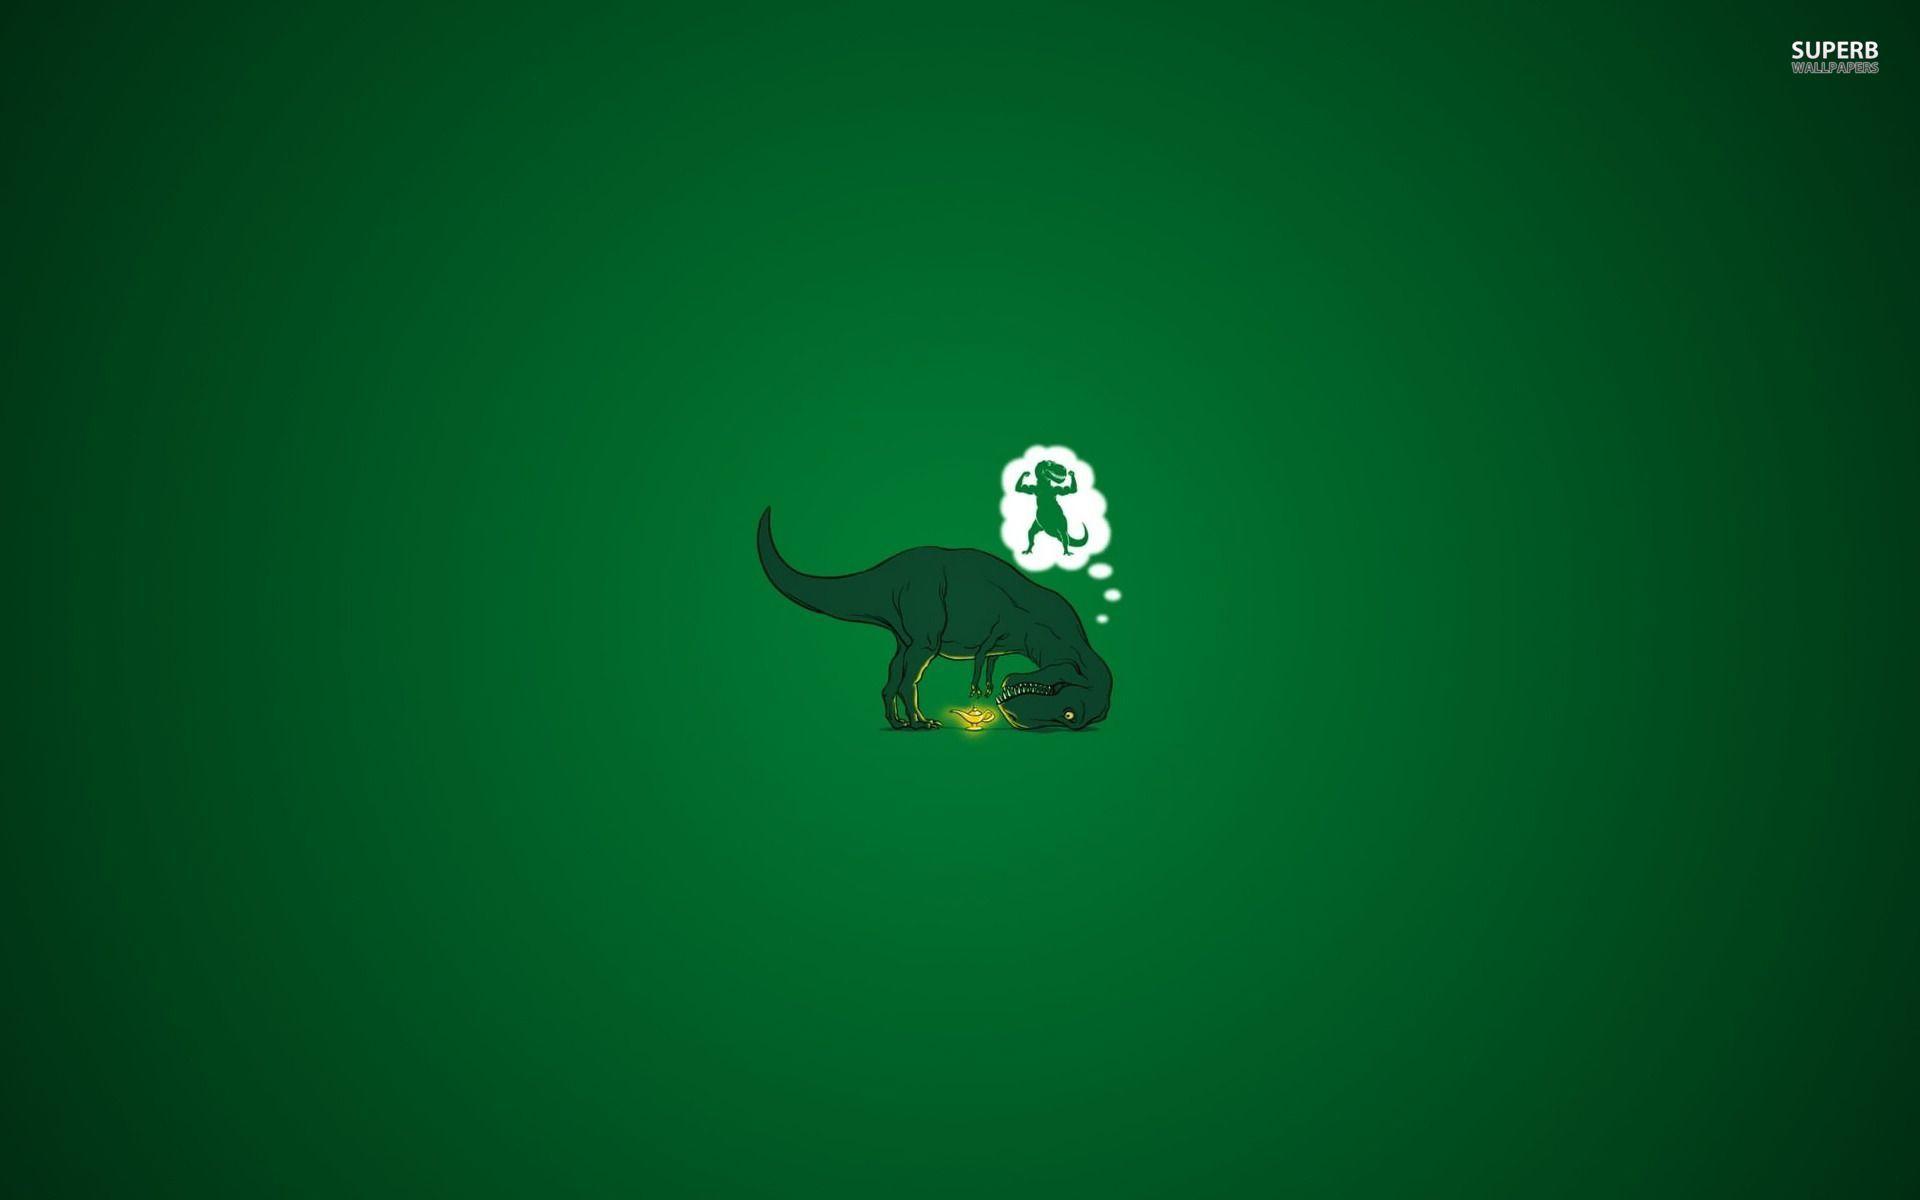 Kawaii Dinosaur Wallpapers - Top Free Kawaii Dinosaur ...